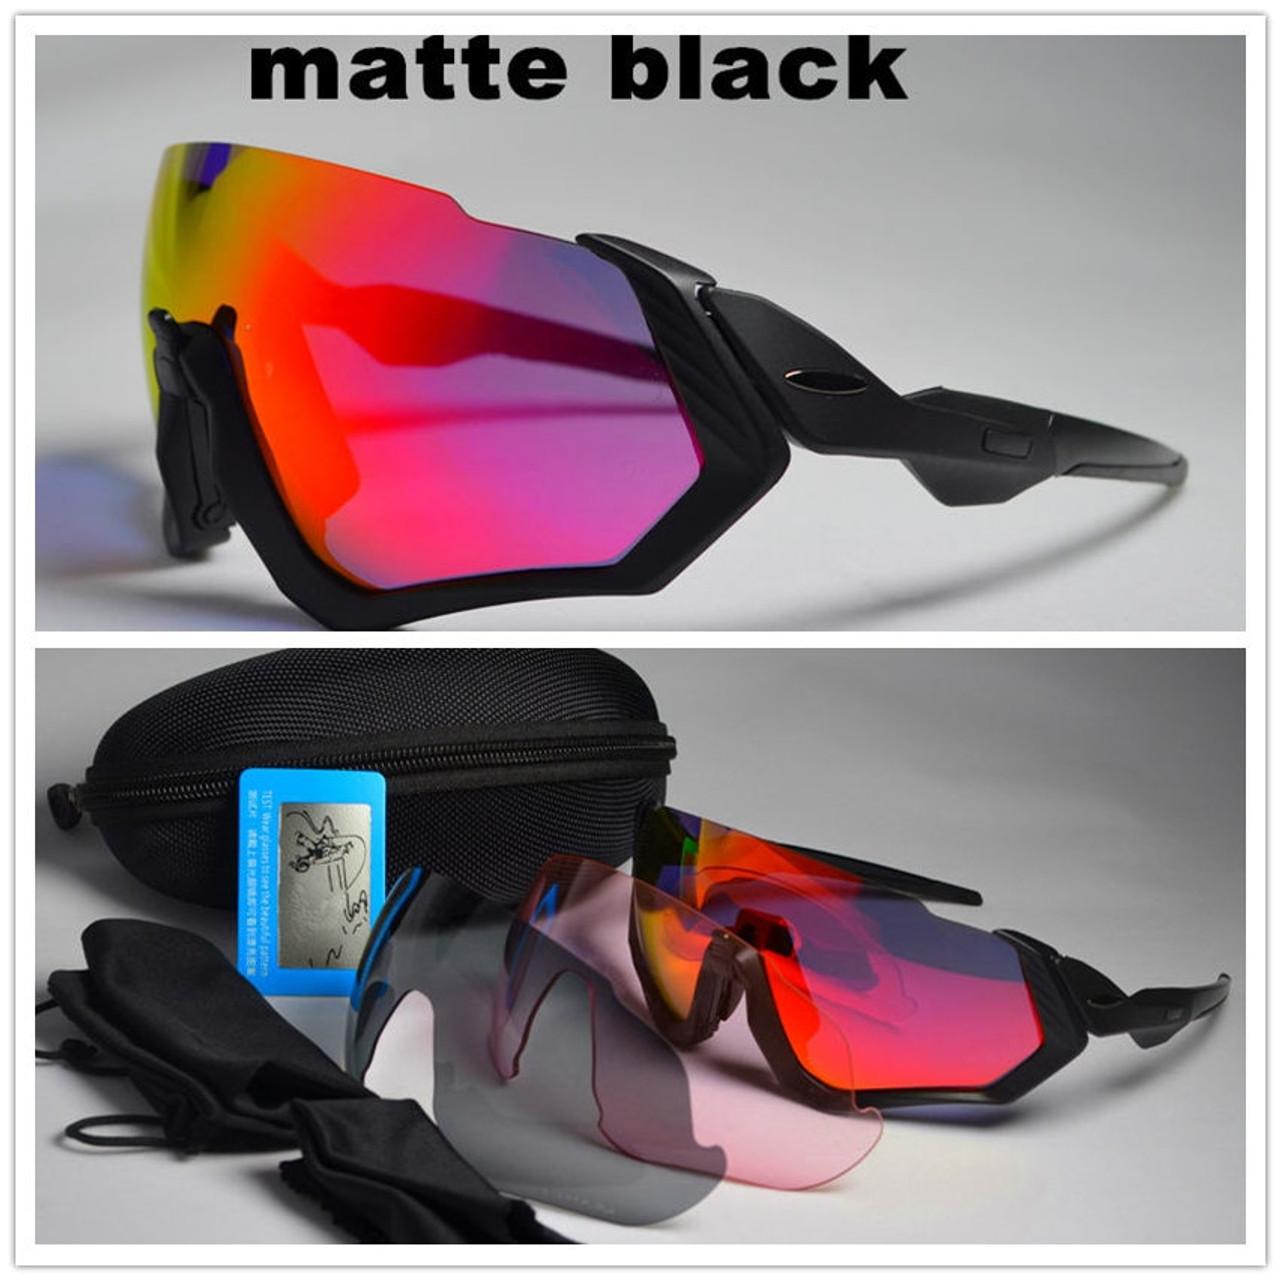 09b94f85c2e peter sagan 3 lens UV400 Bicycle Cycling glasses Men Women Sport Road Bike  Cycling Eyewear ...